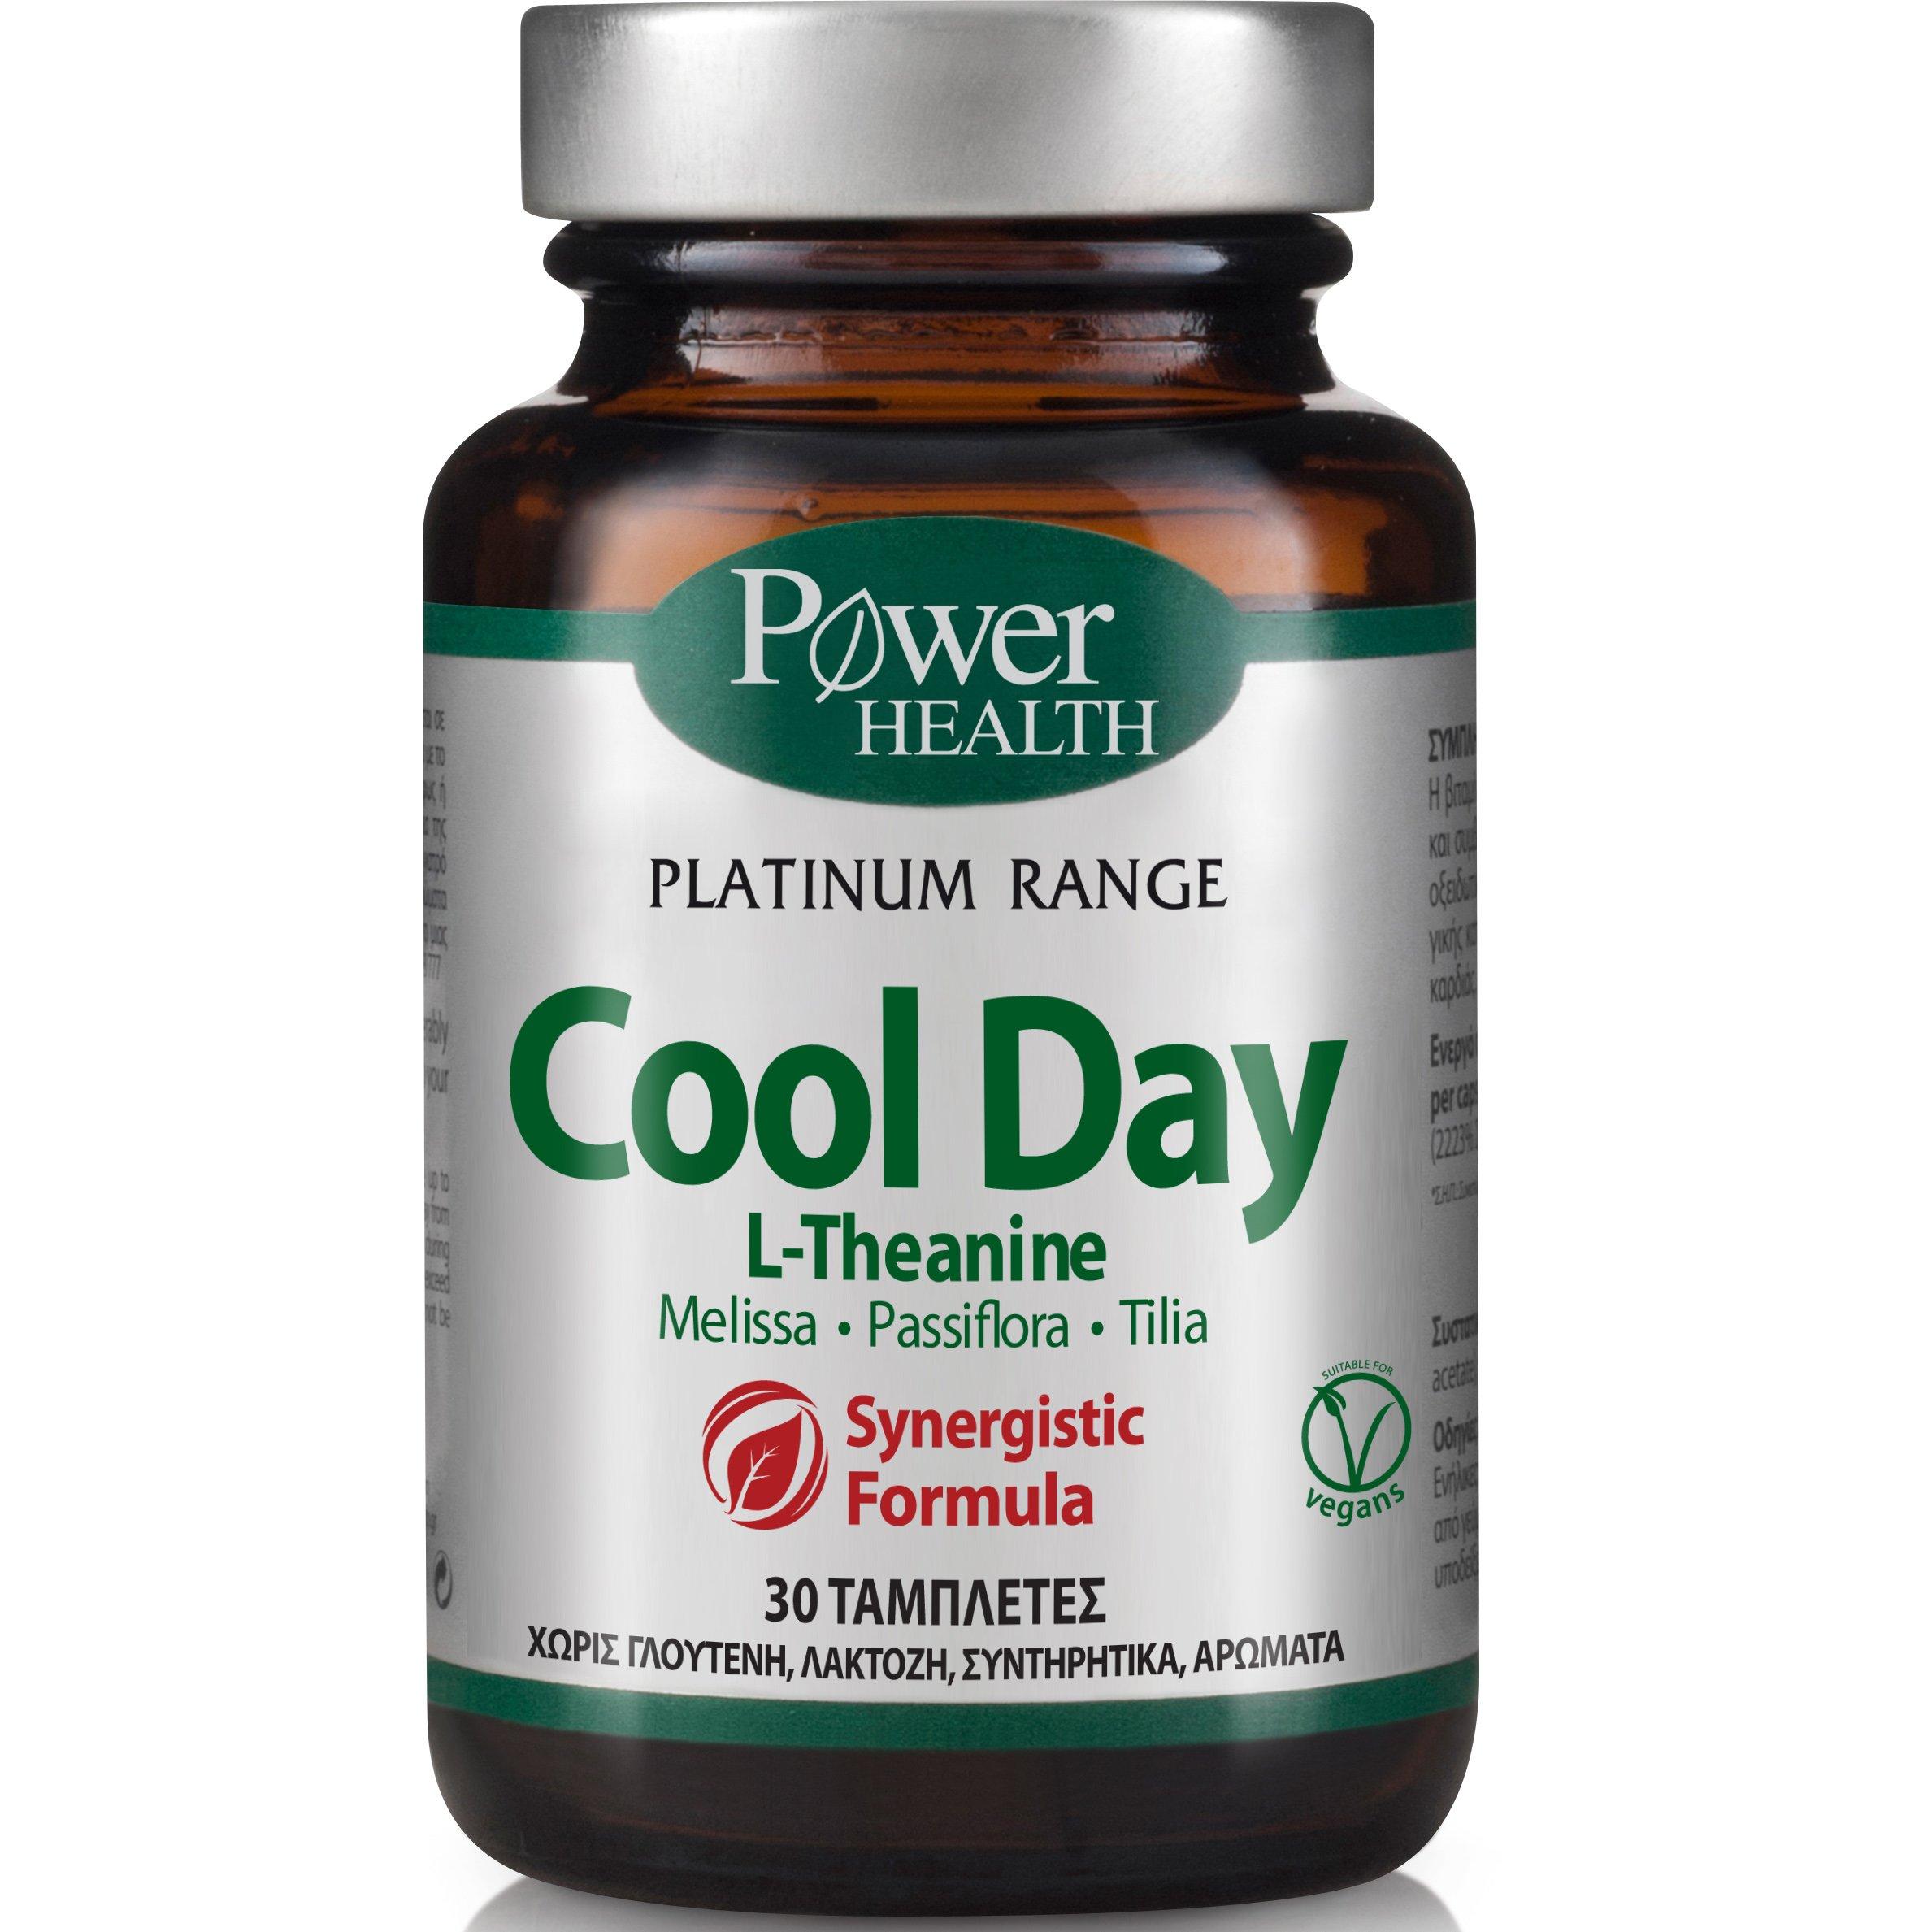 Power Health Platinum Cool Day Συμπλήρωμα Διατροφής, Αντιμετώπιση Άγχους και Συμπτωμάτων, Χωρίς Παρενέργειες ή Εθισμό 30tabs